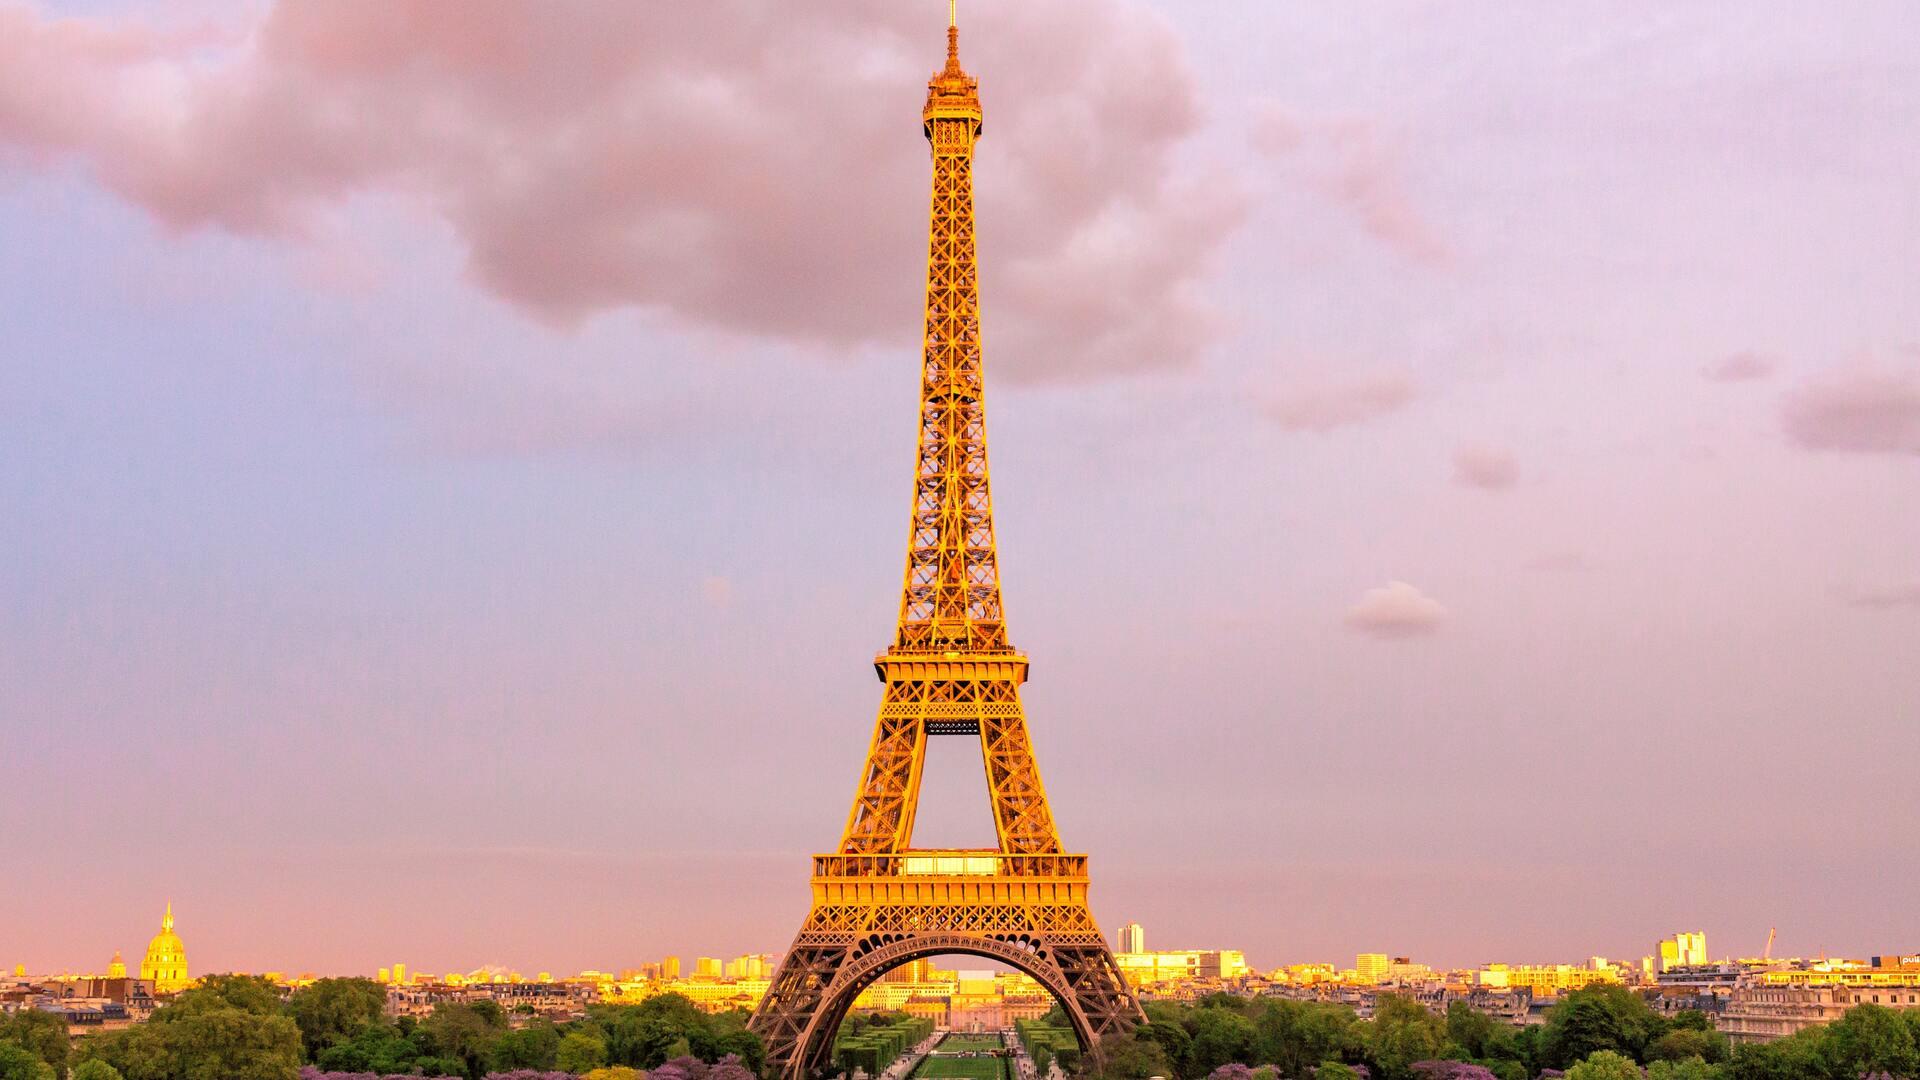 1920x1080 Eiffel Tower In Paris Laptop Full Hd 1080p Hd 4k